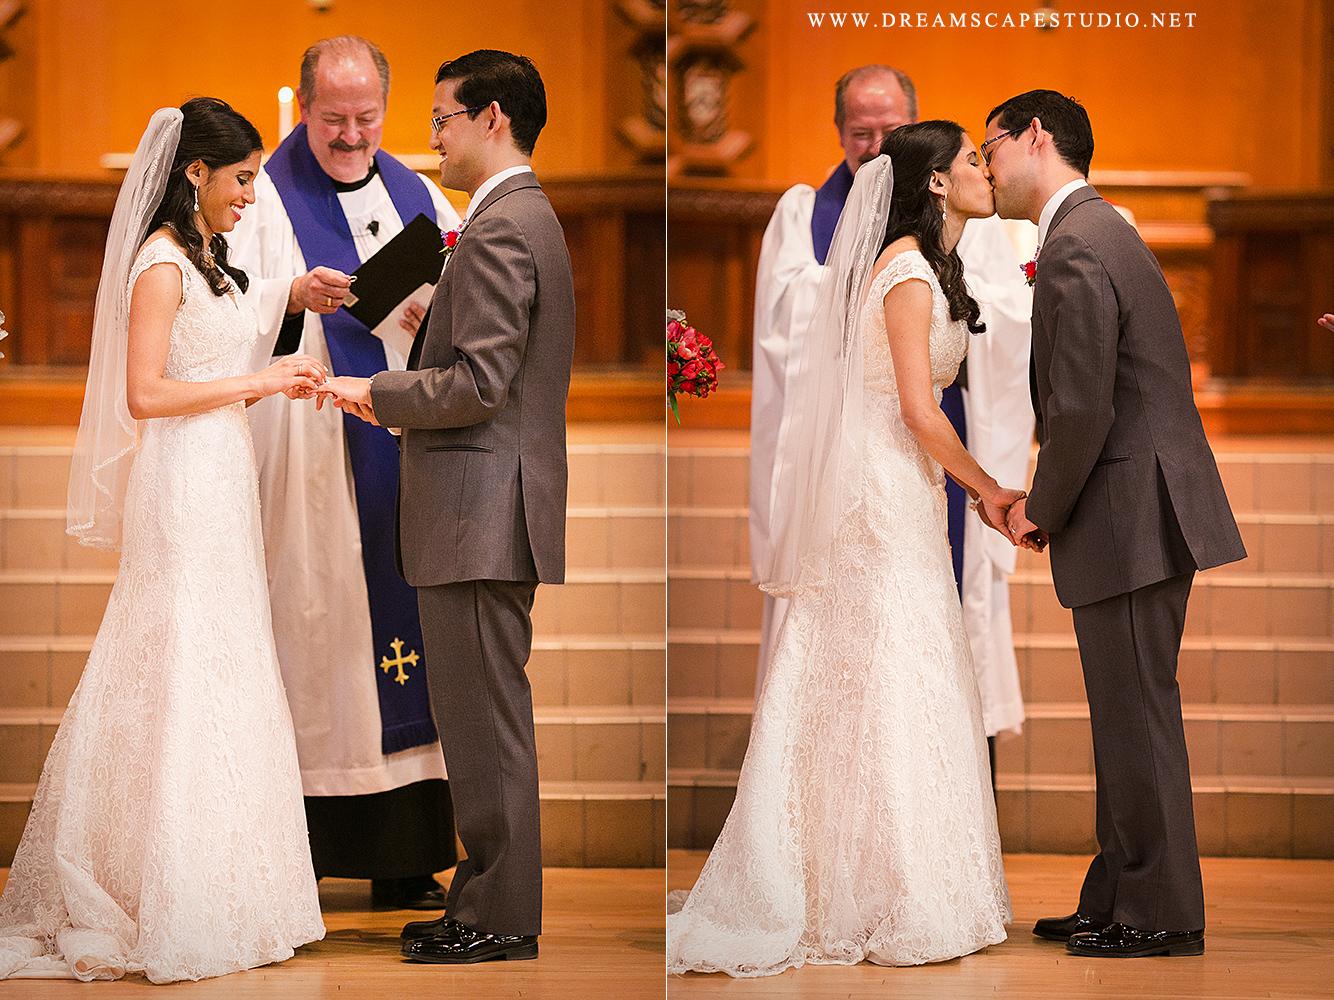 CT_Wedding_Photographer_PaHe_Blog_18.jpg